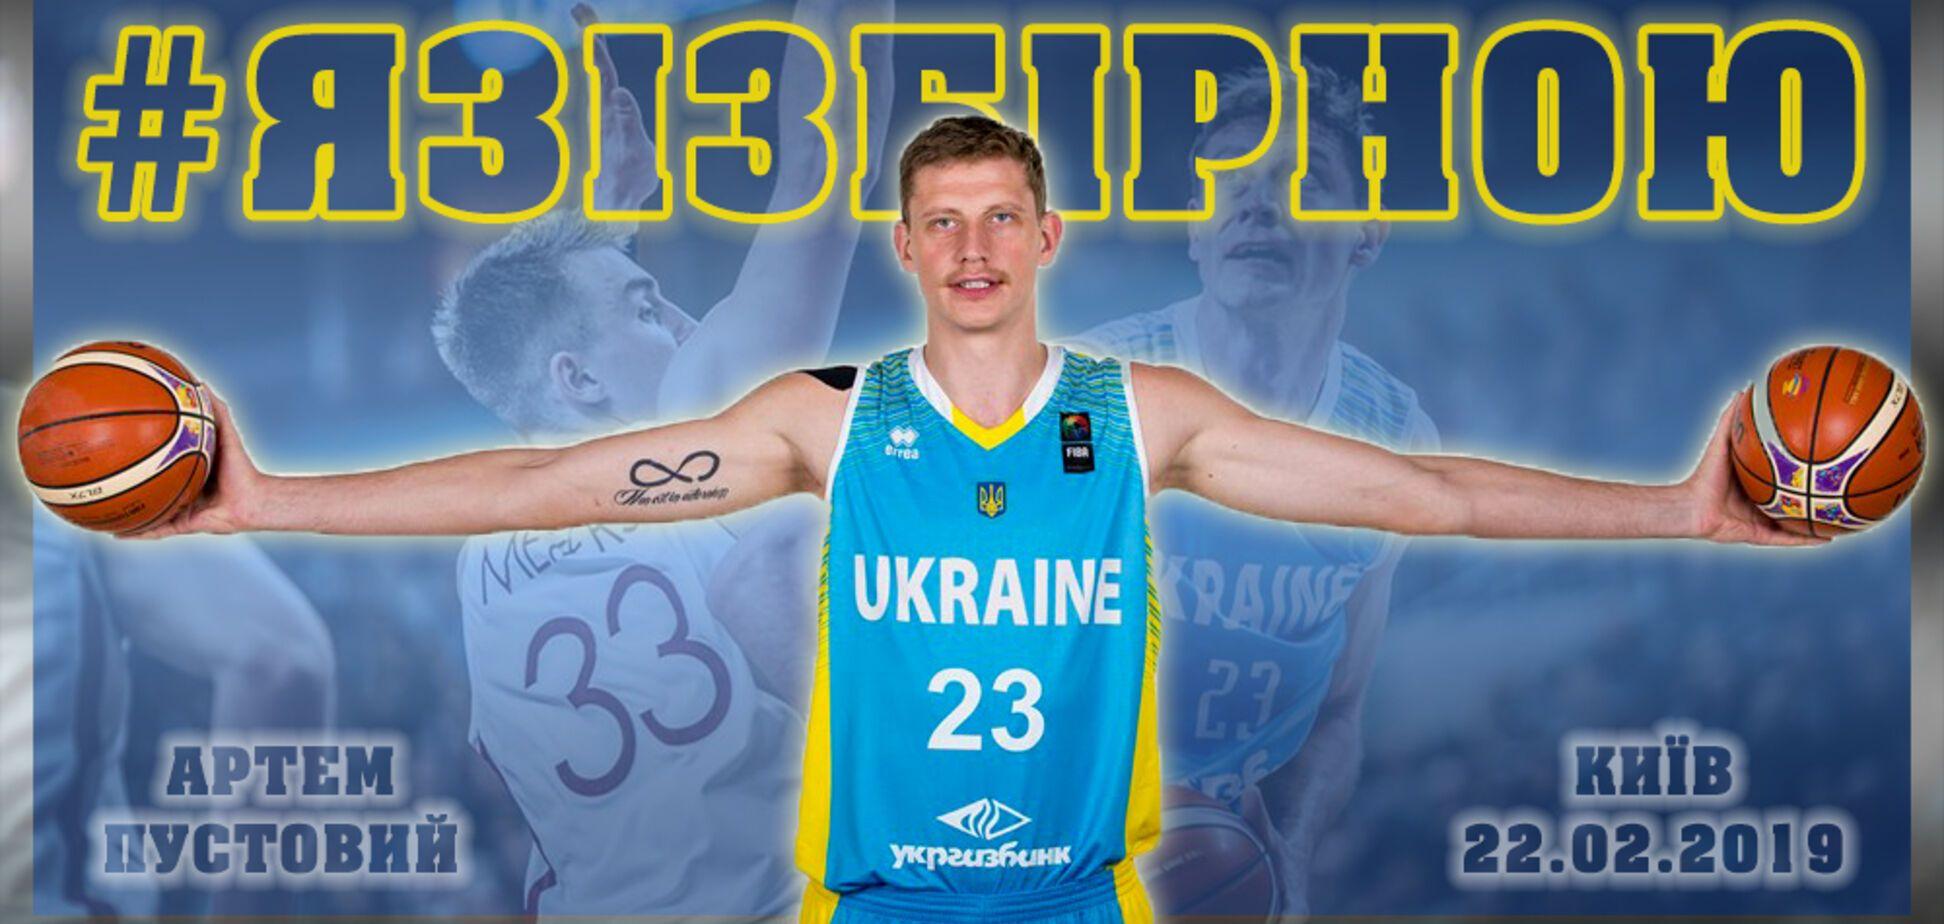 Баскетболист 'Барселоны' усилит сборную Украины на матчах Кубка мира